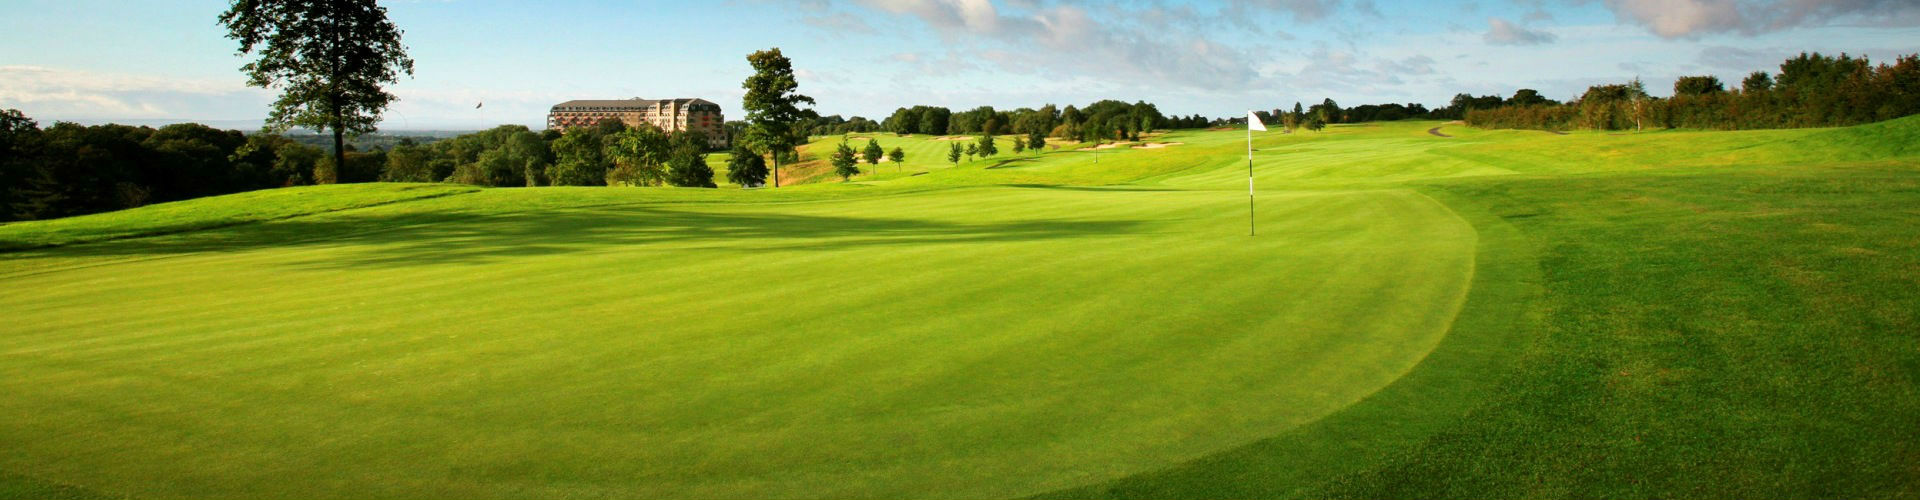 Golfresor Wales - golfreseguiden.se